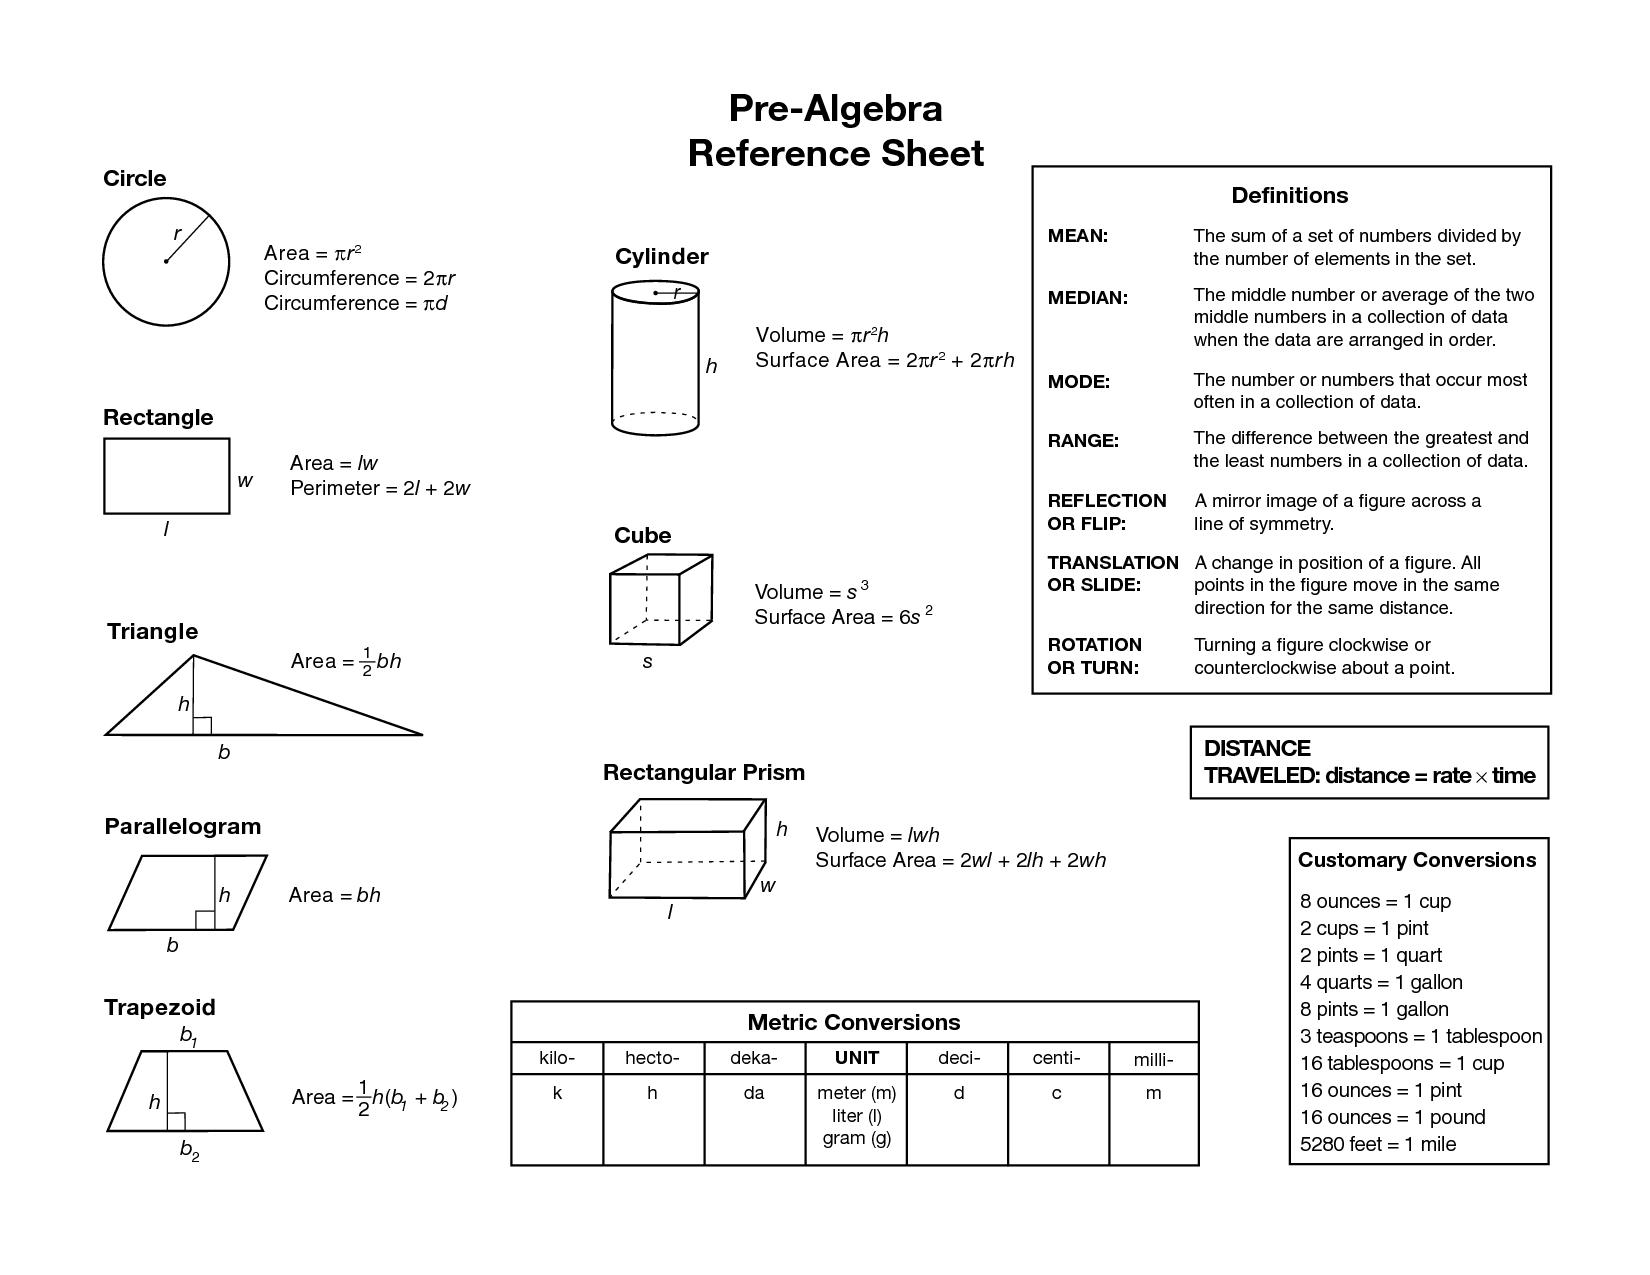 Algebraic Equations Chart | Pre Algebra Reference Sheet - Pre Algebra PNG